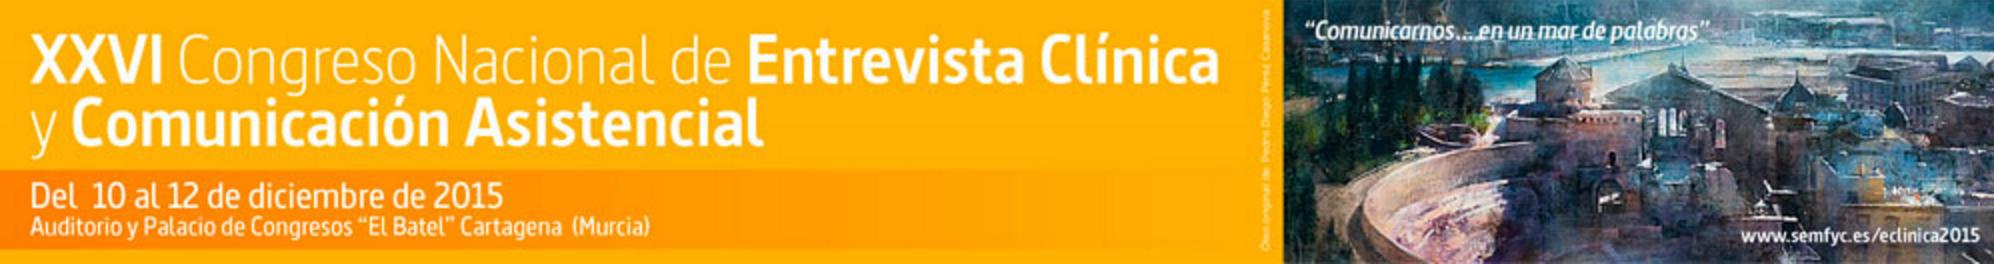 XXVI Congreso Nacional de Entrevista Clinica y comunicación asistencial